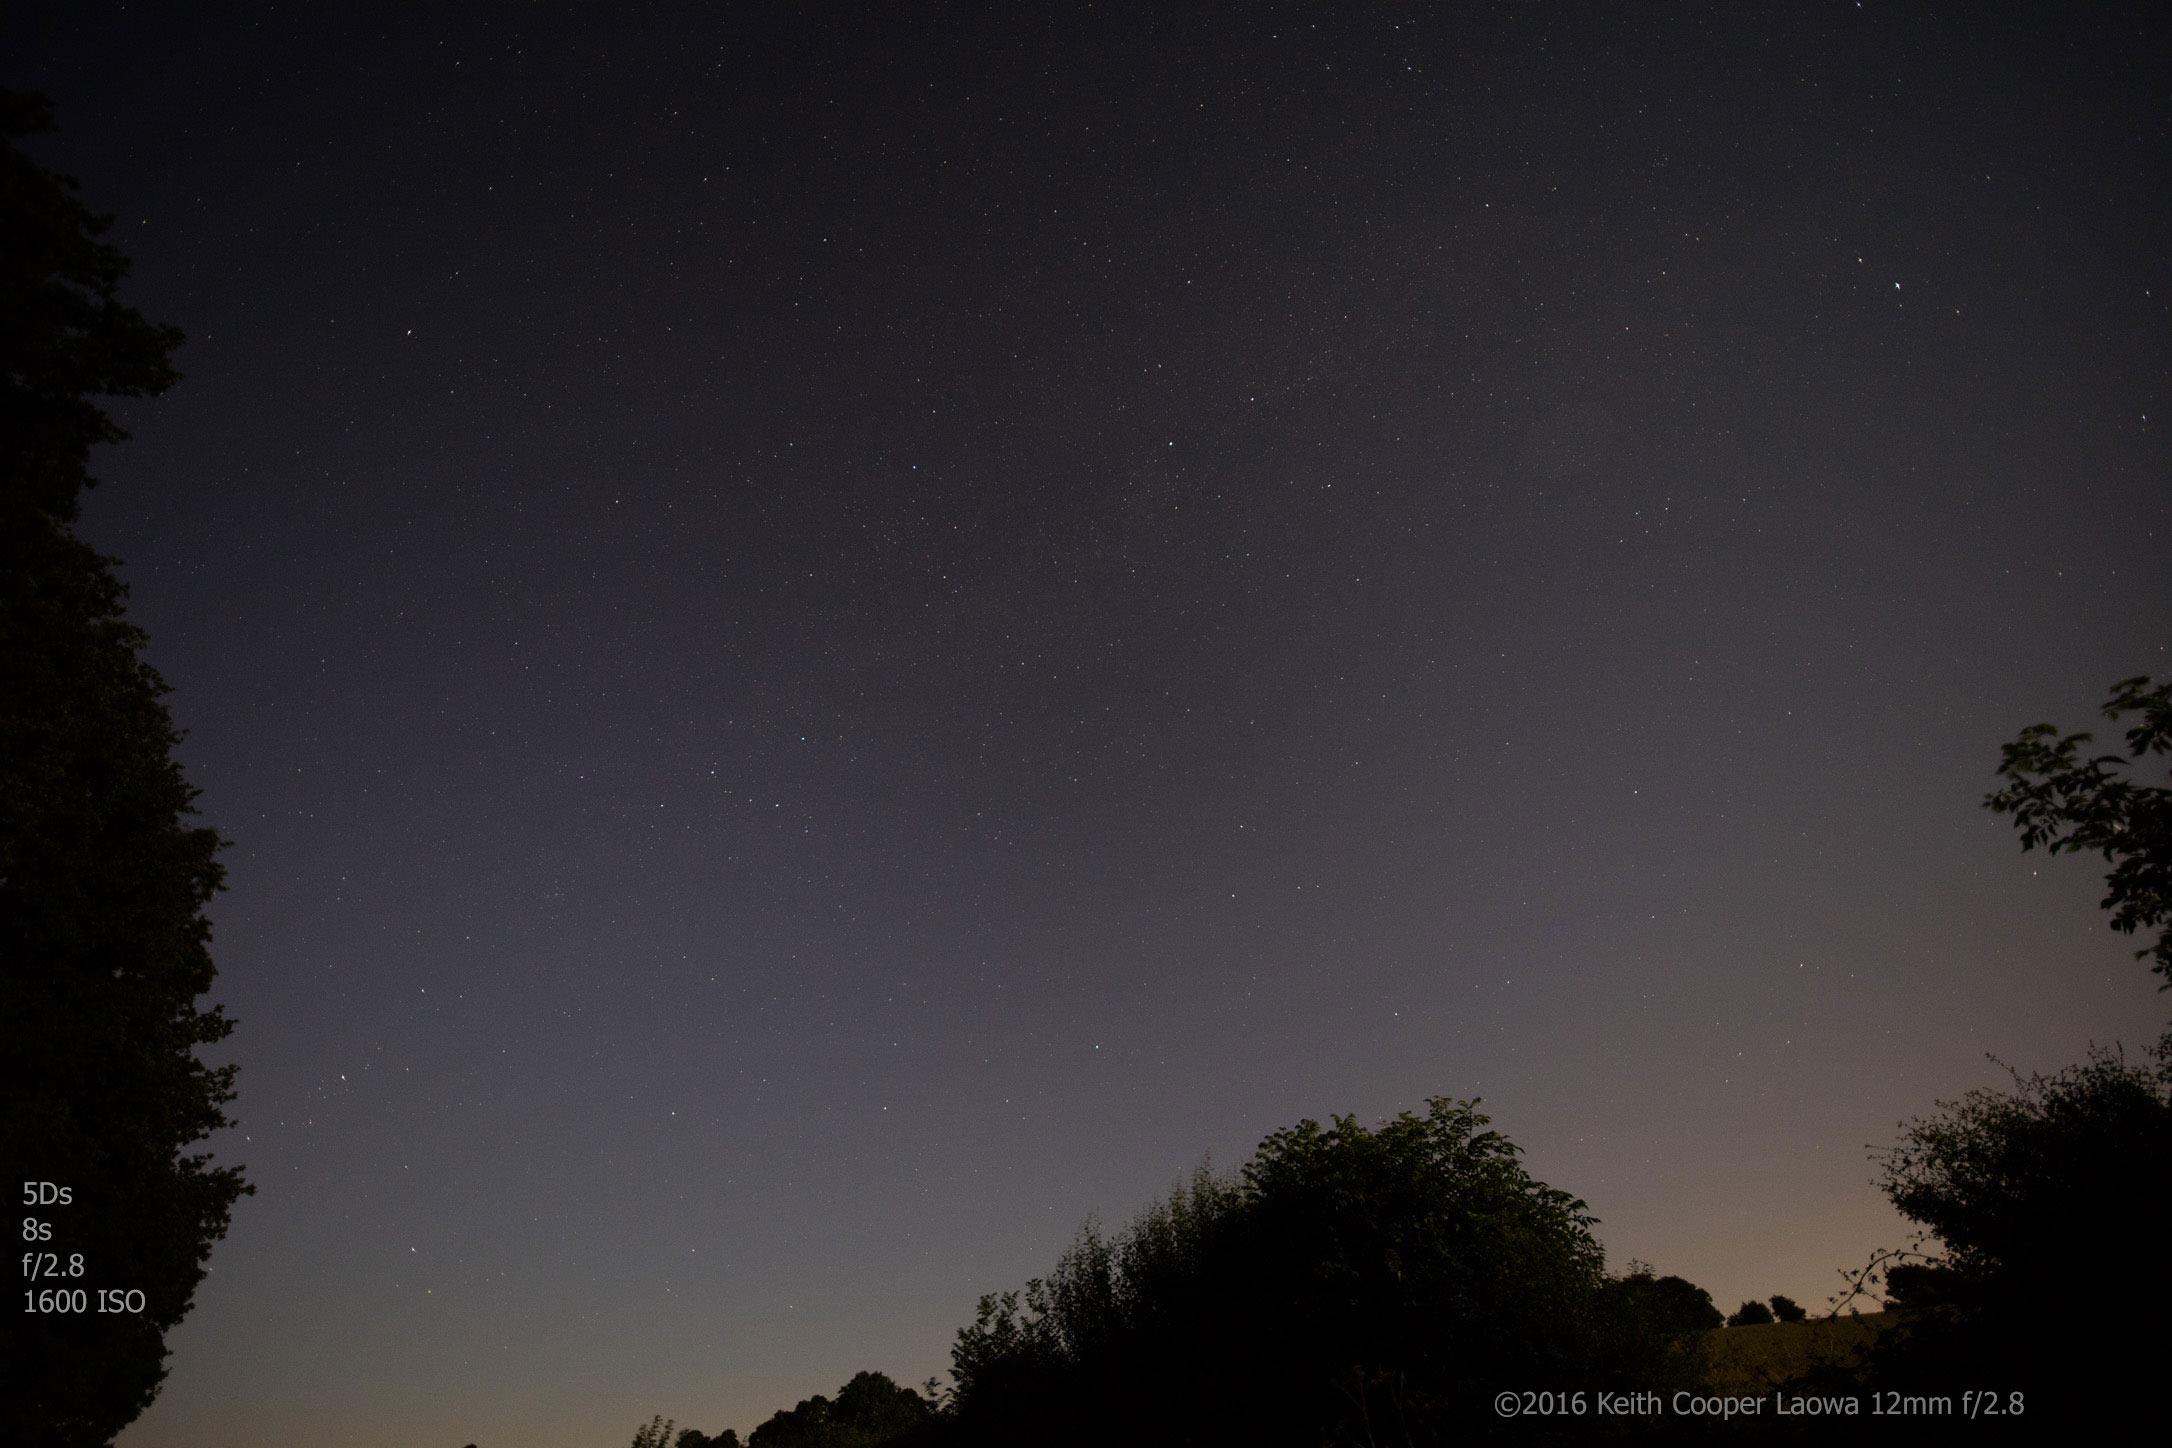 stars - view of the night sky